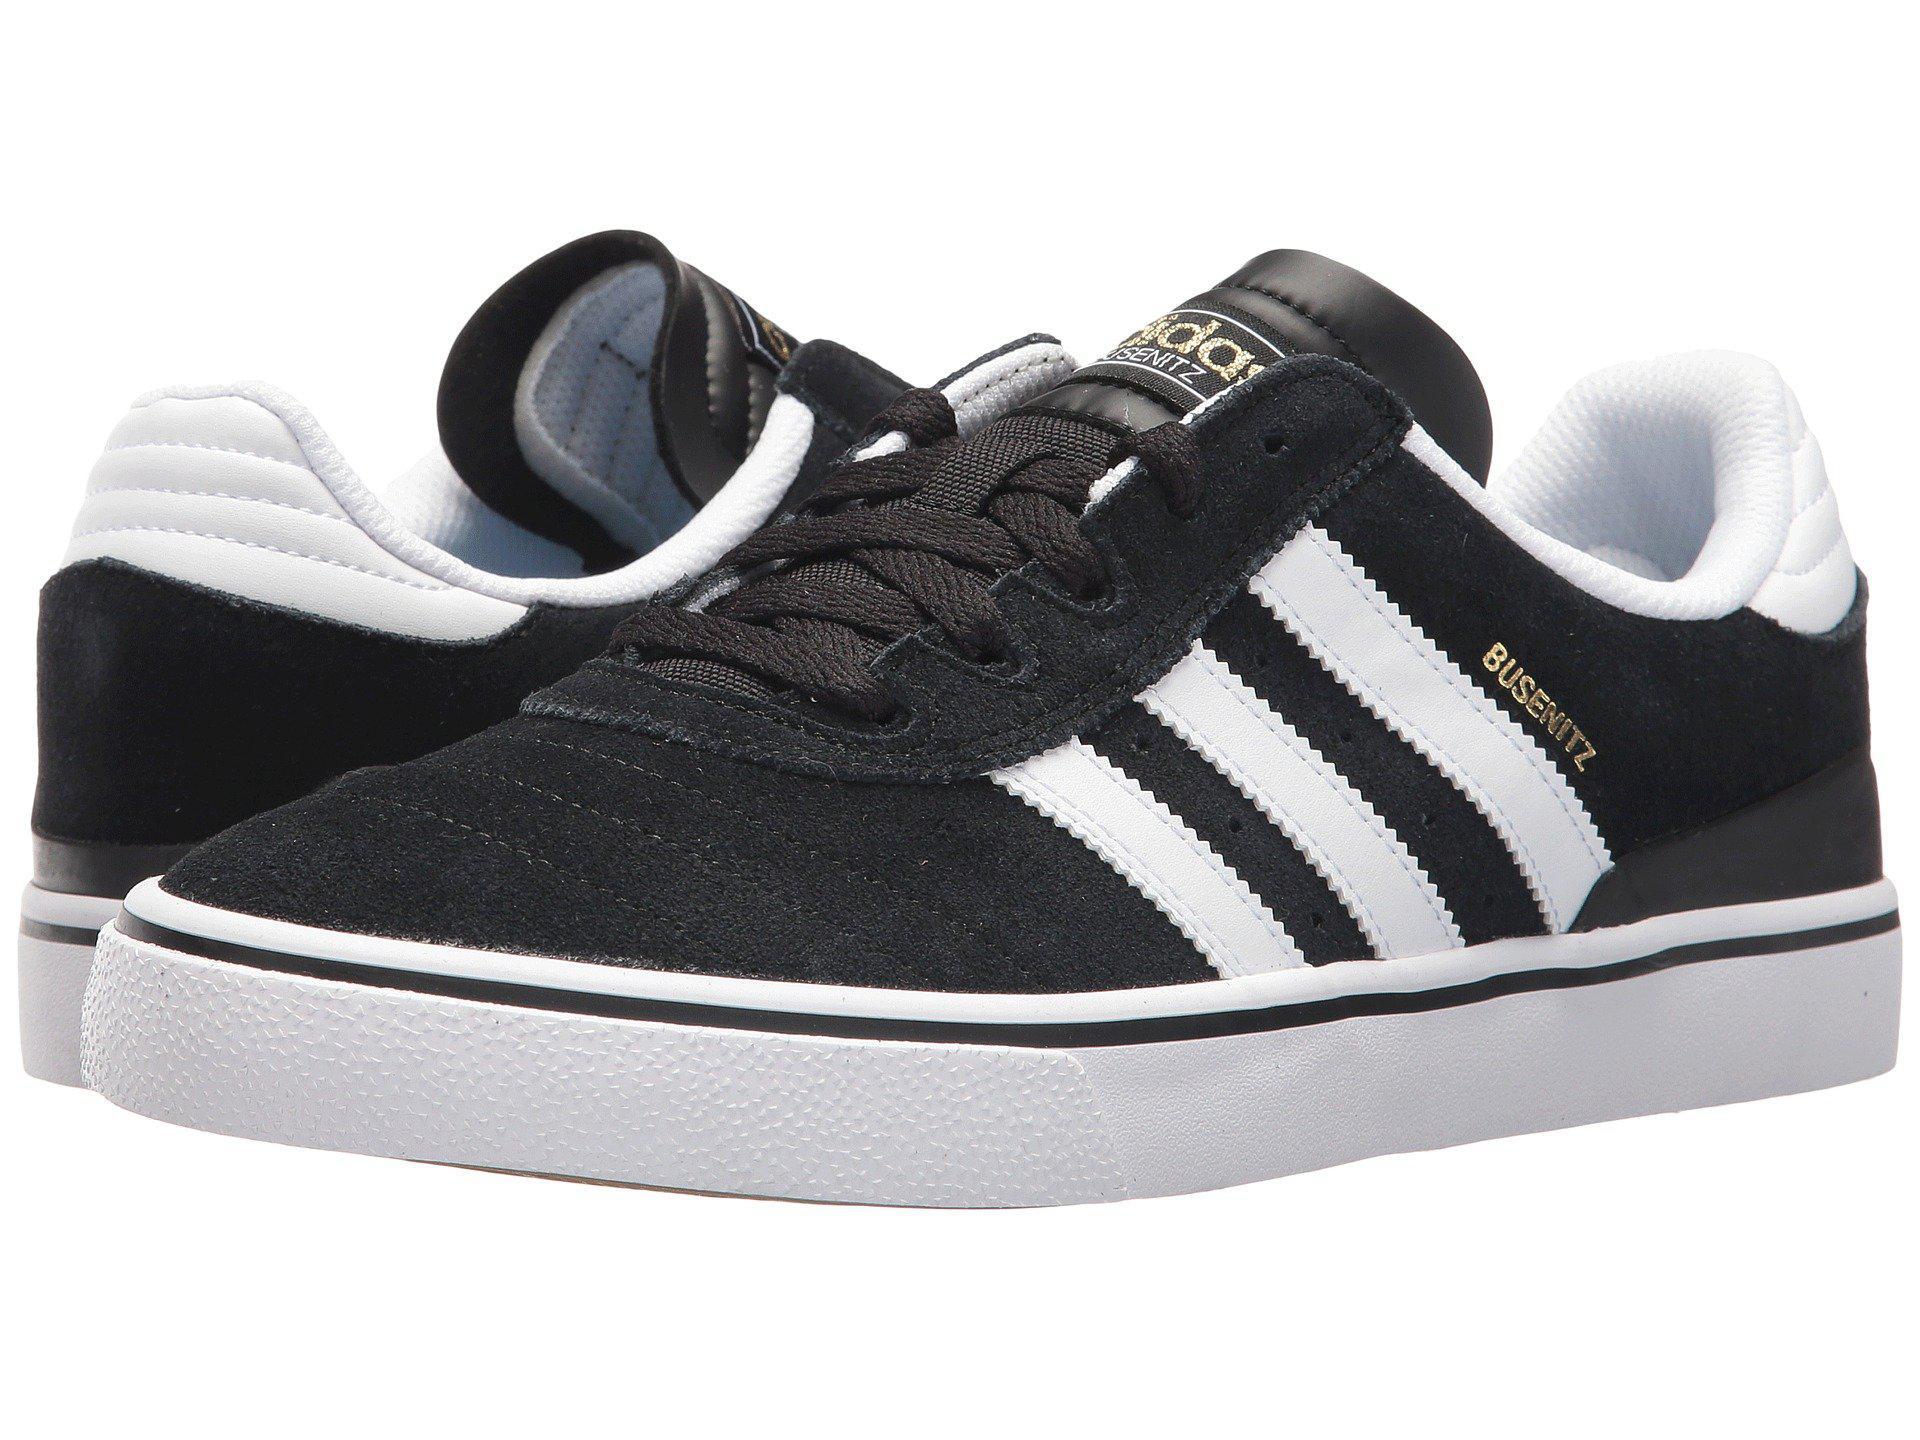 reputable site a5c81 de5eb adidas Originals. Black Busenitz Vulc (collegiate Navy white dark Blue)  Men s Skate Shoes